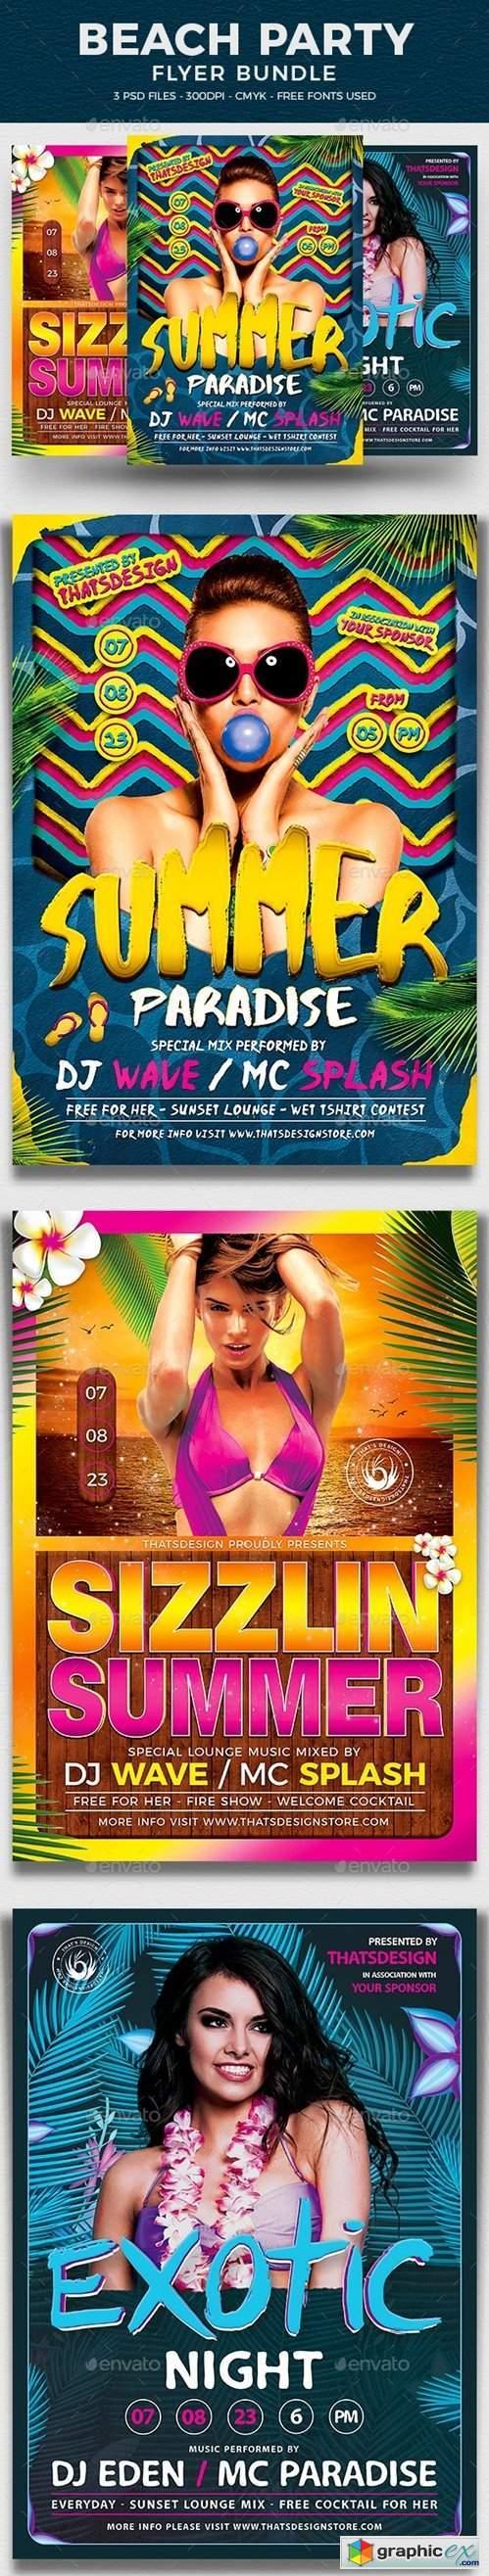 Beach Party Flyer Bundle V3